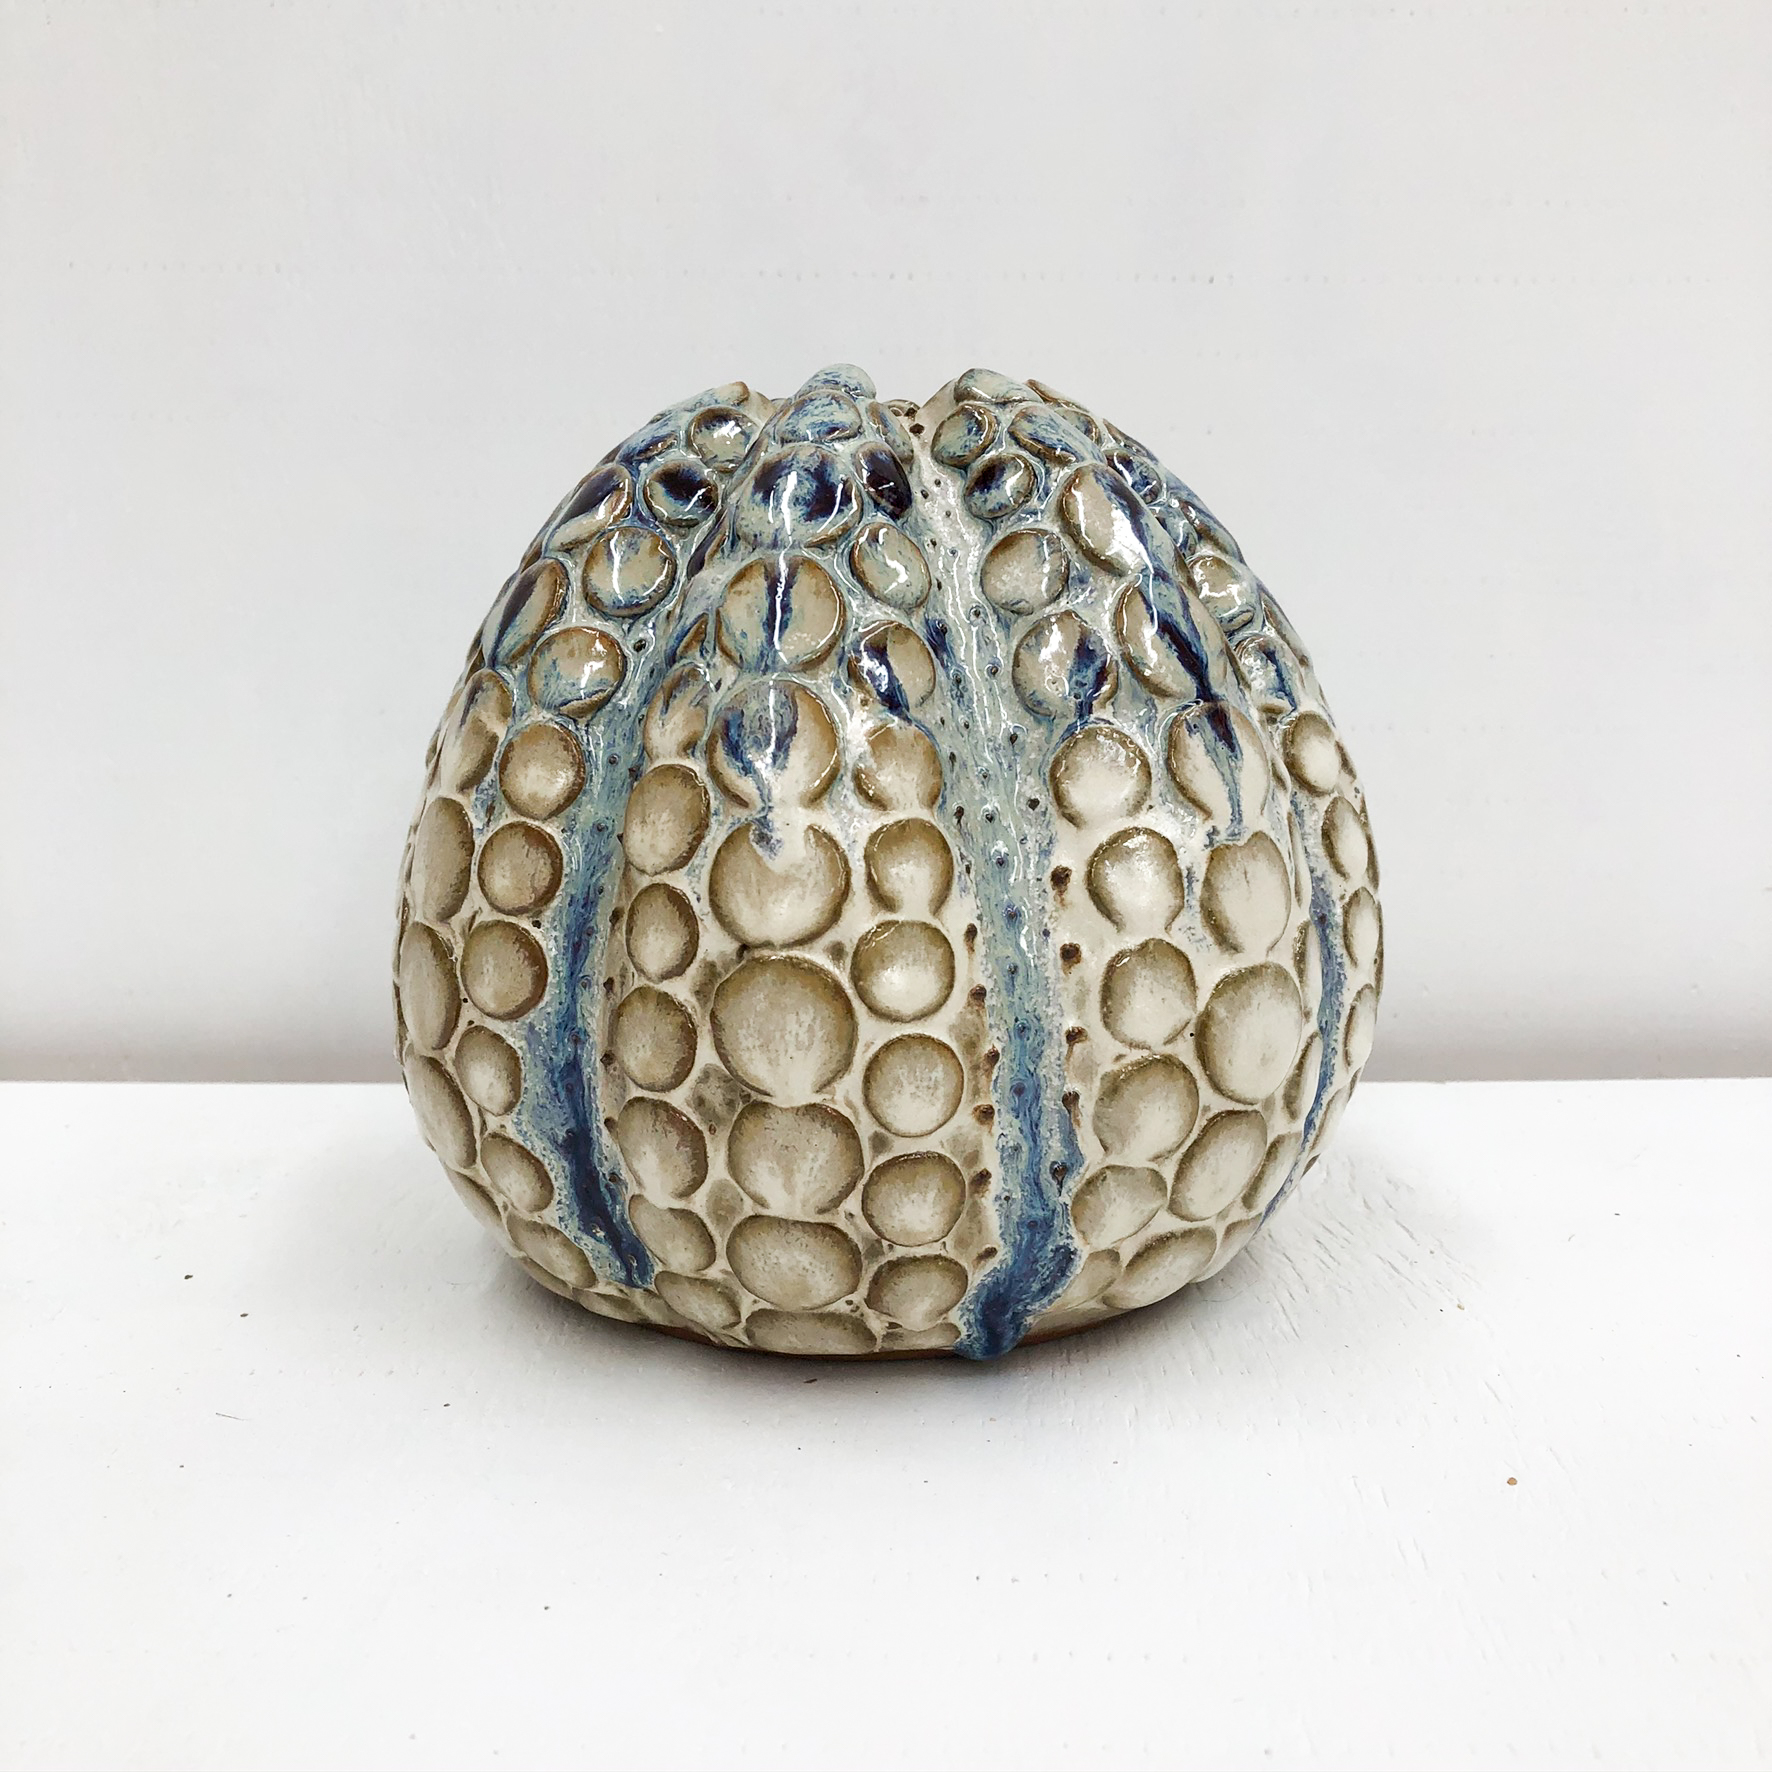 Octopus Handmade Vase - Blue & White - empty